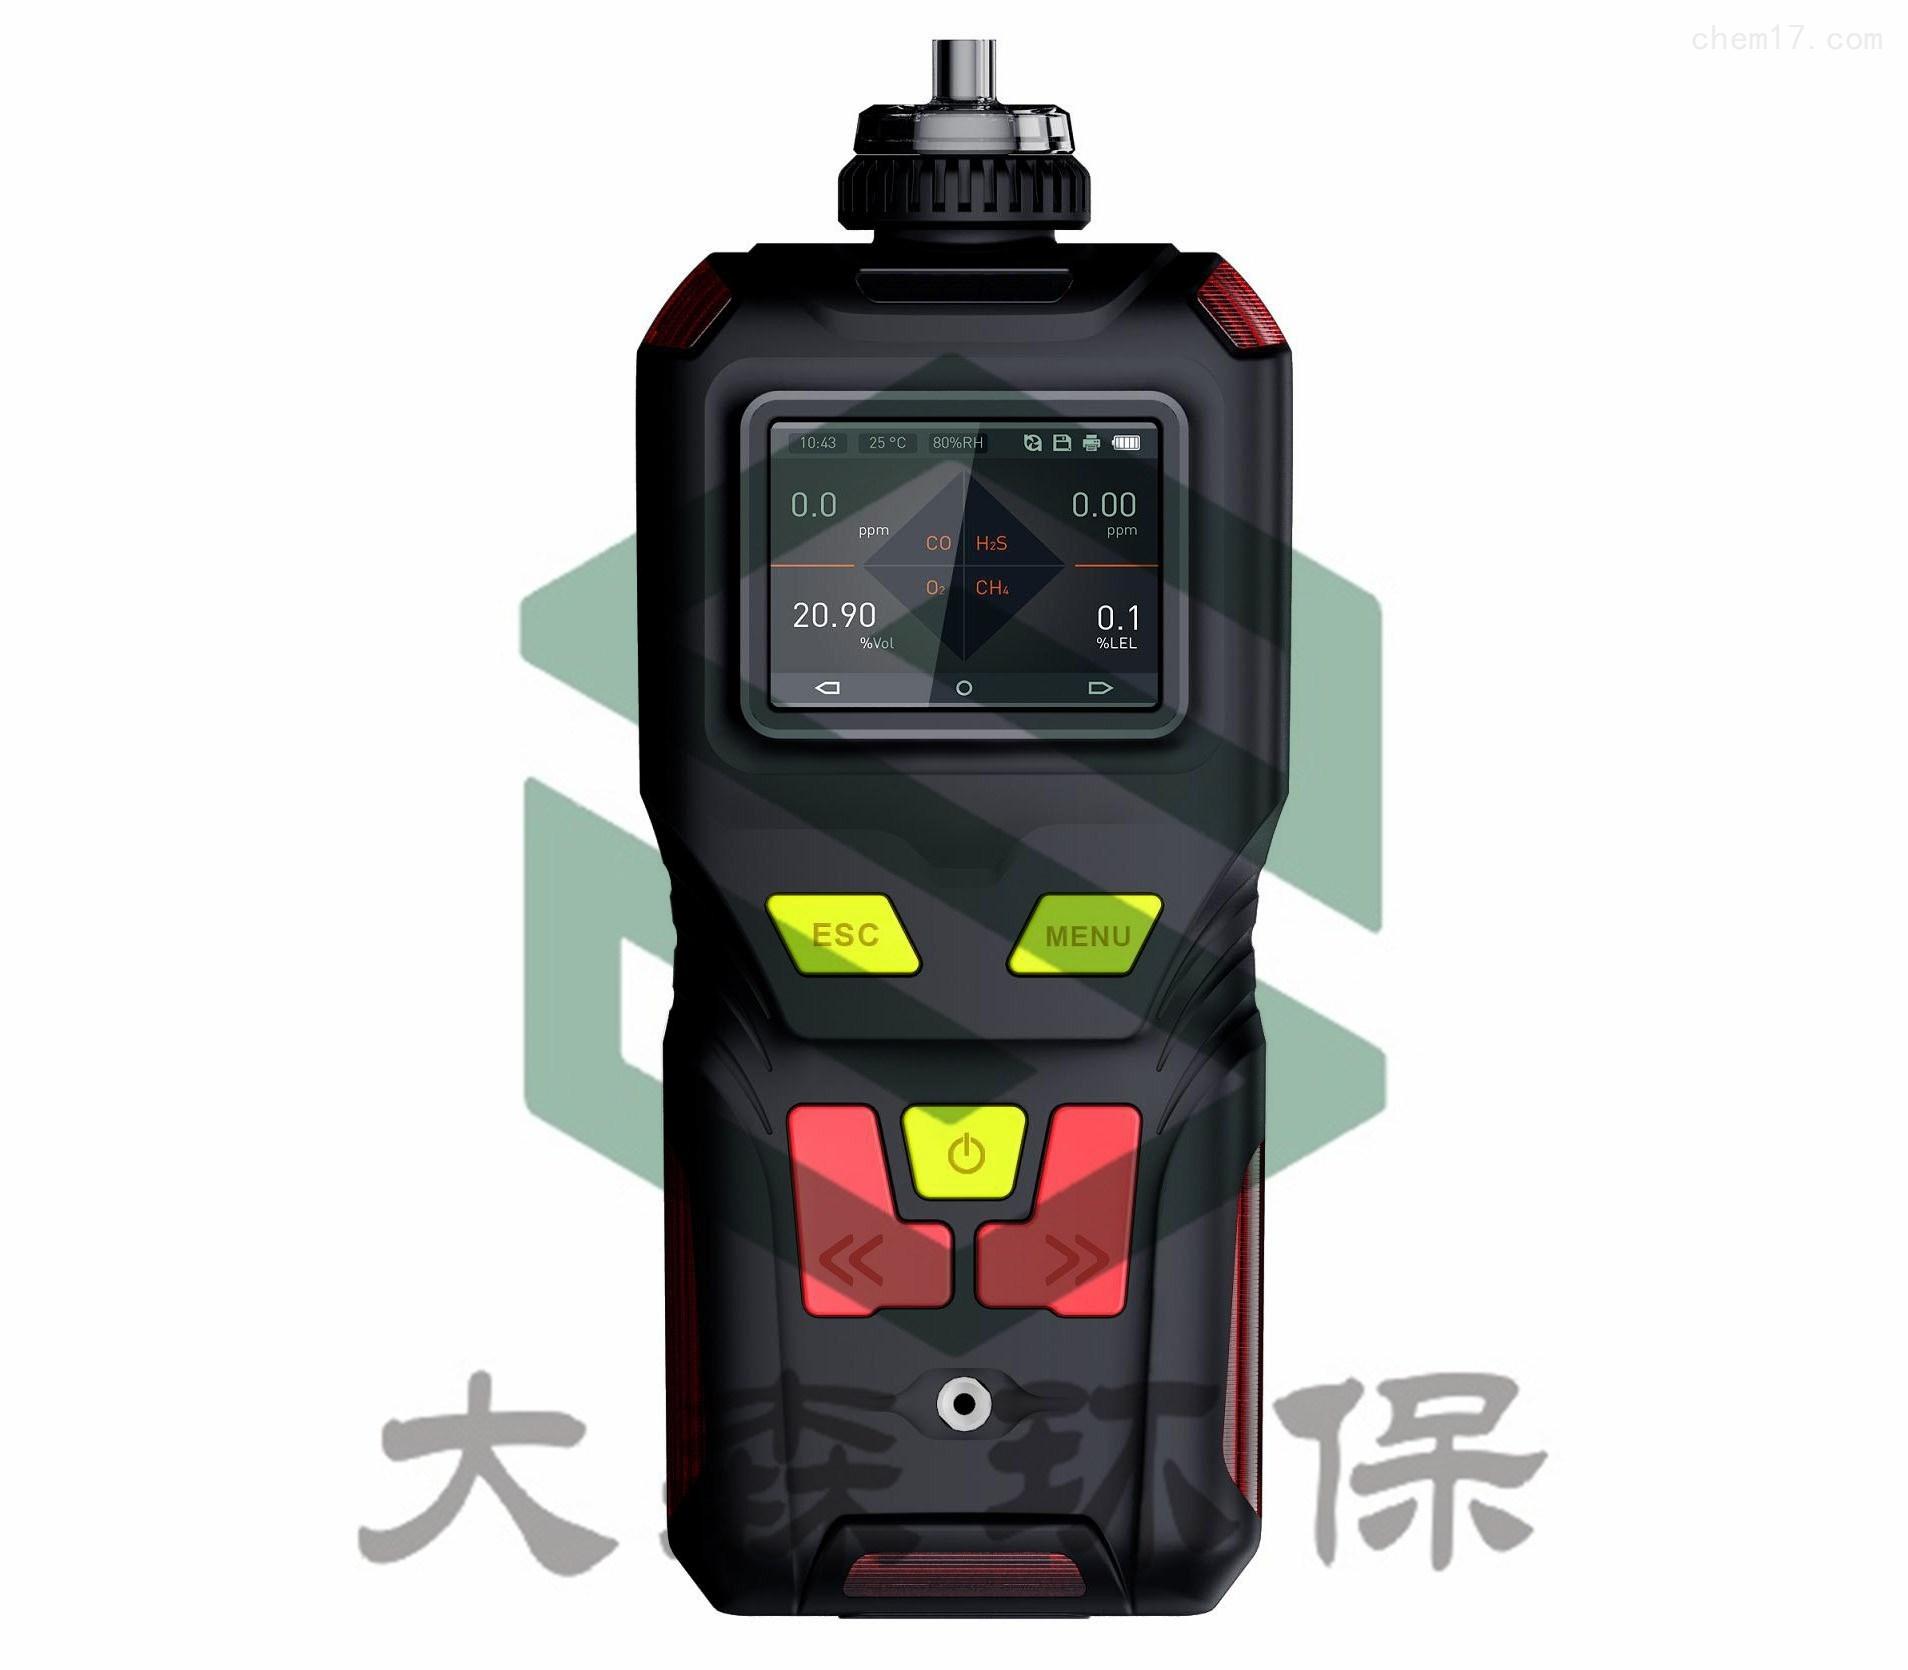 DSA4000泵吸式四合一气体检测仪